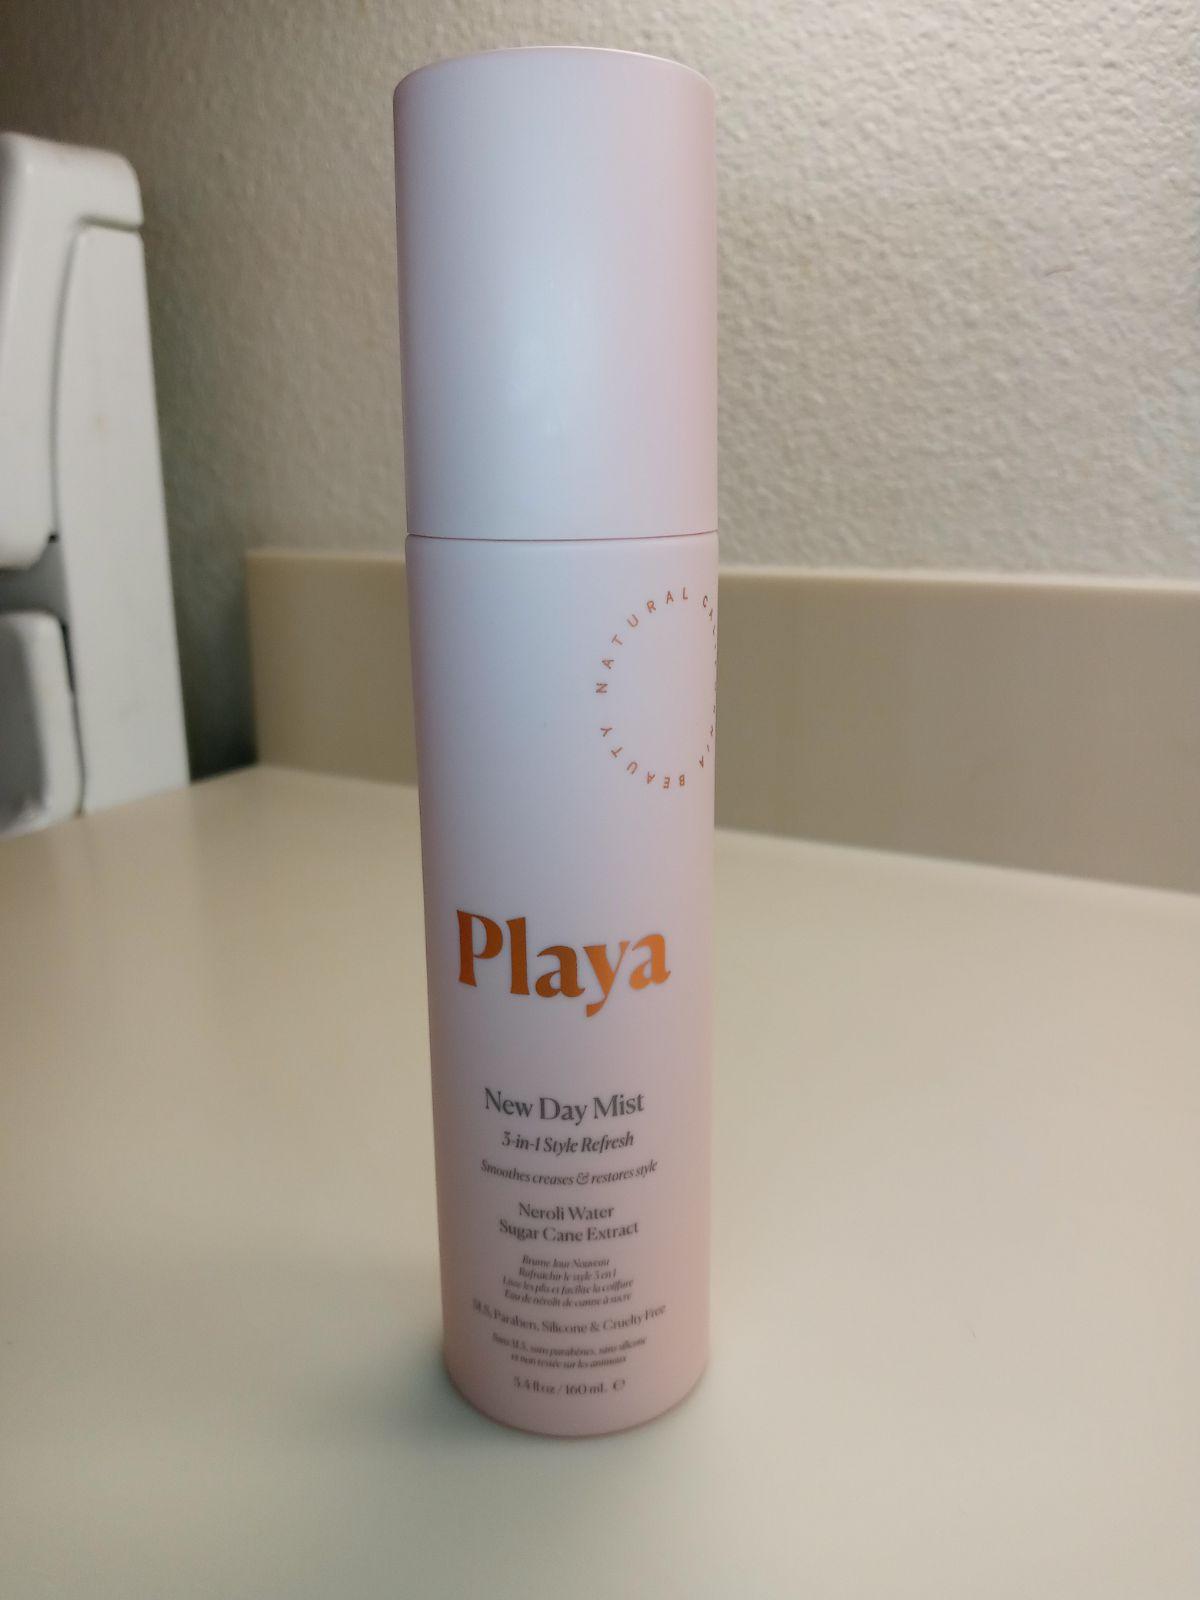 Playa hair products